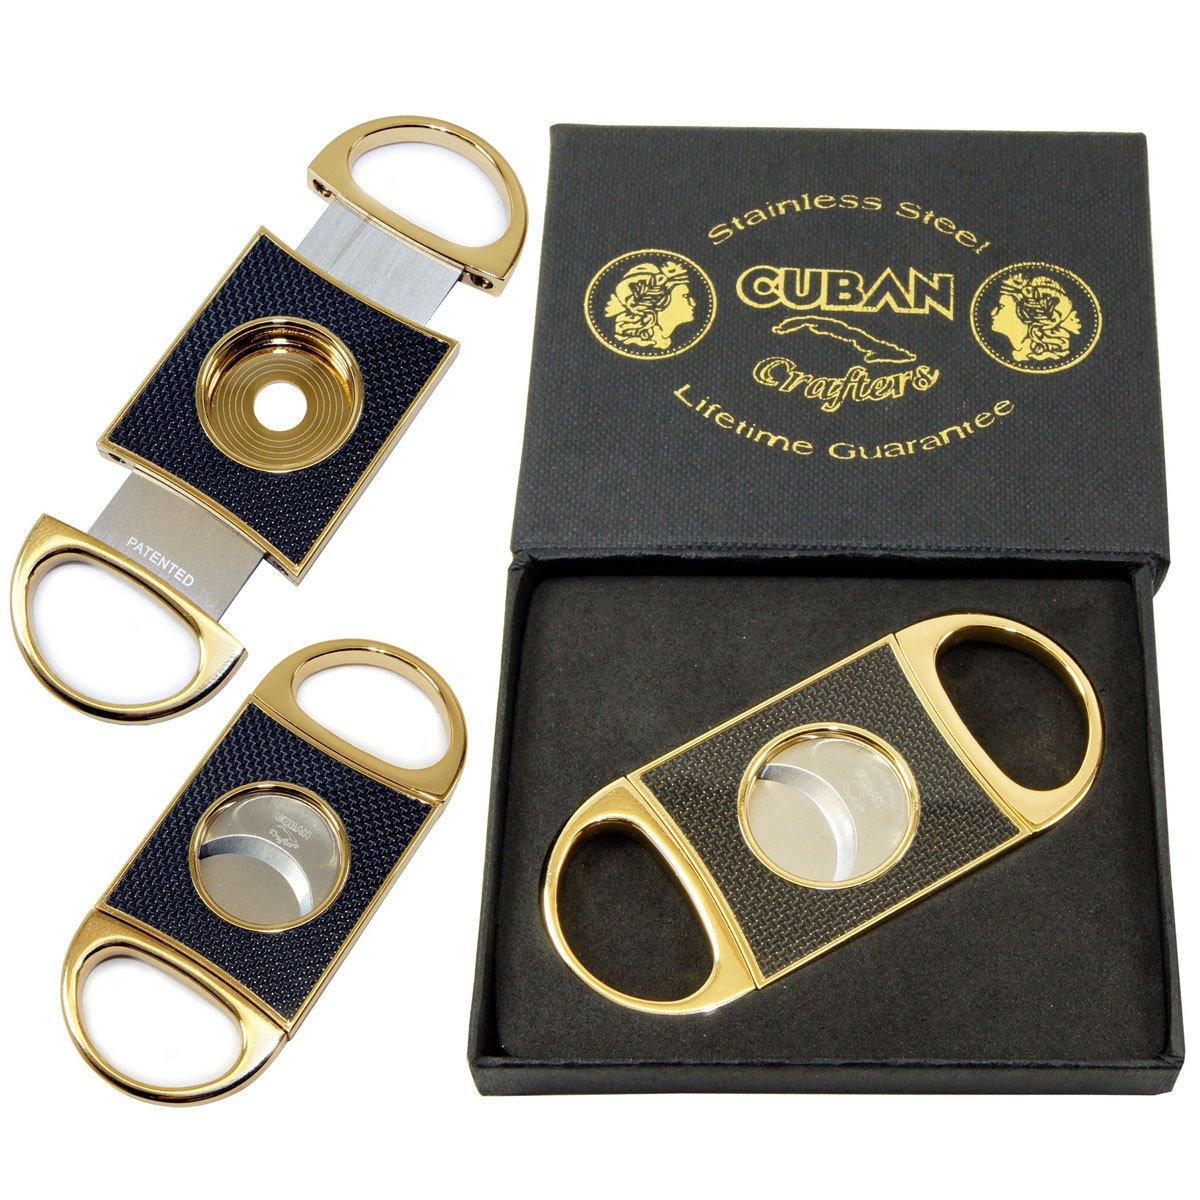 Cuban Crafters Gold Luxury Cigar Cutter